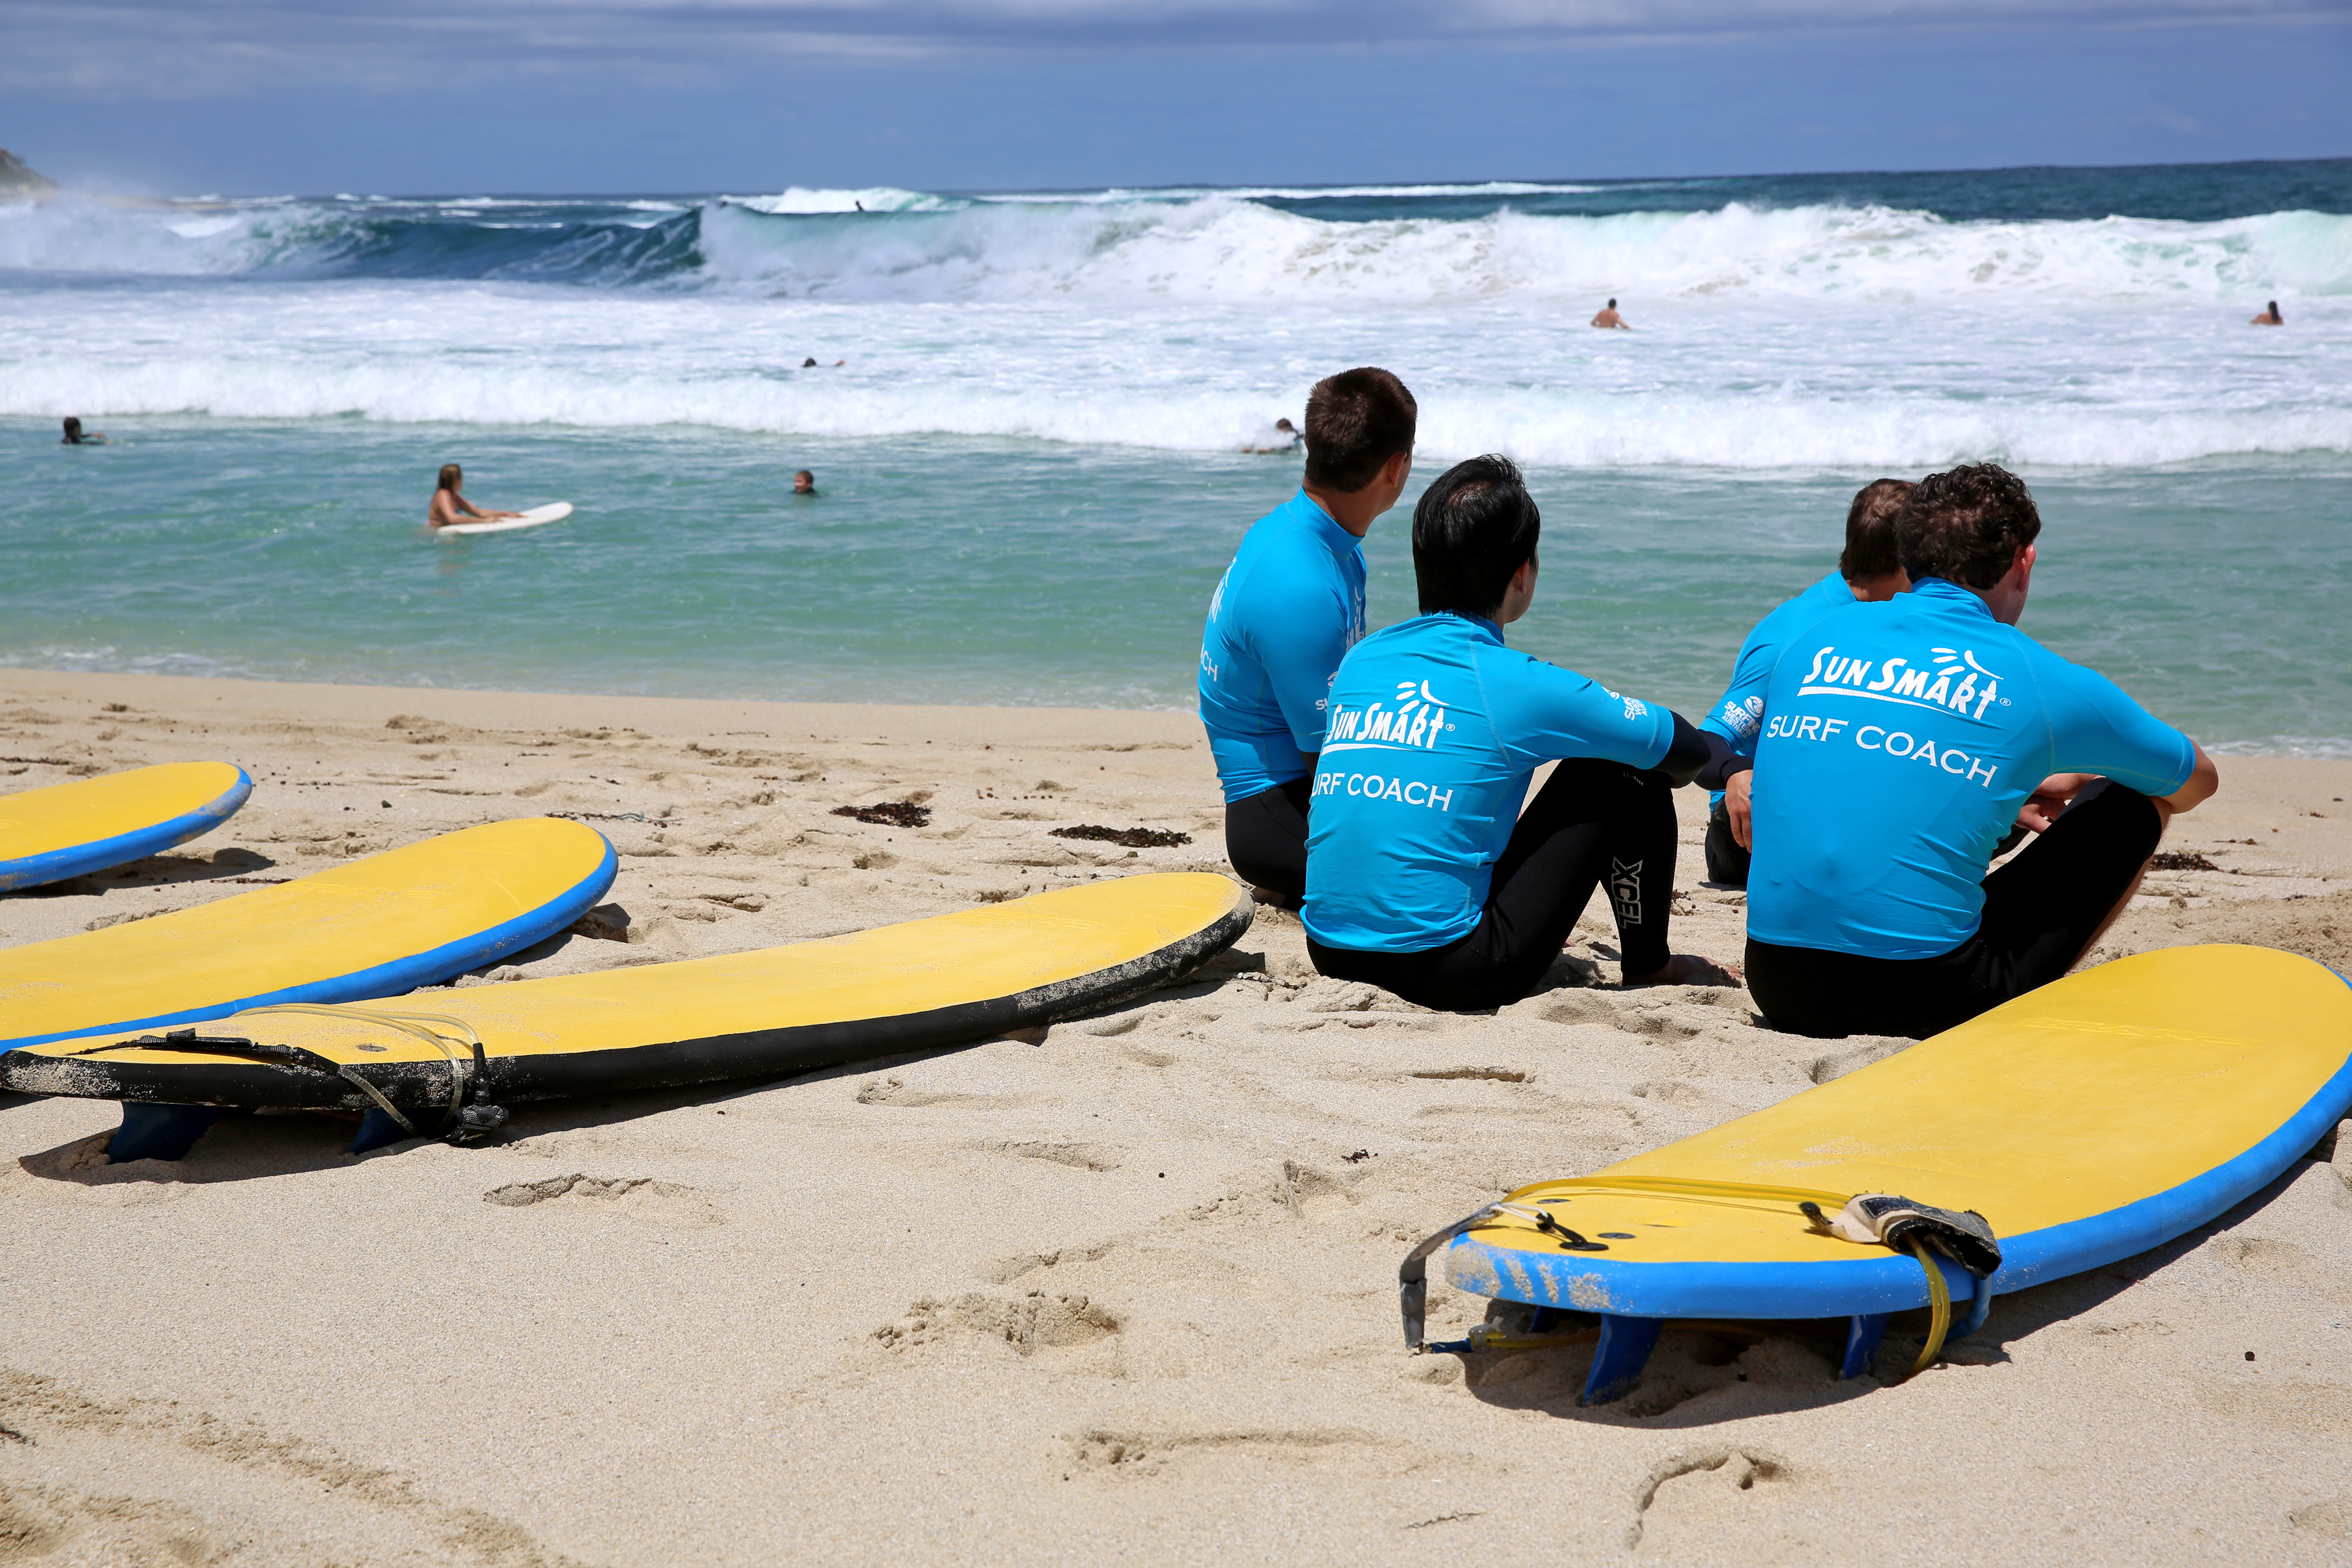 bigstock-Surf-Coaches-57551780.jpg